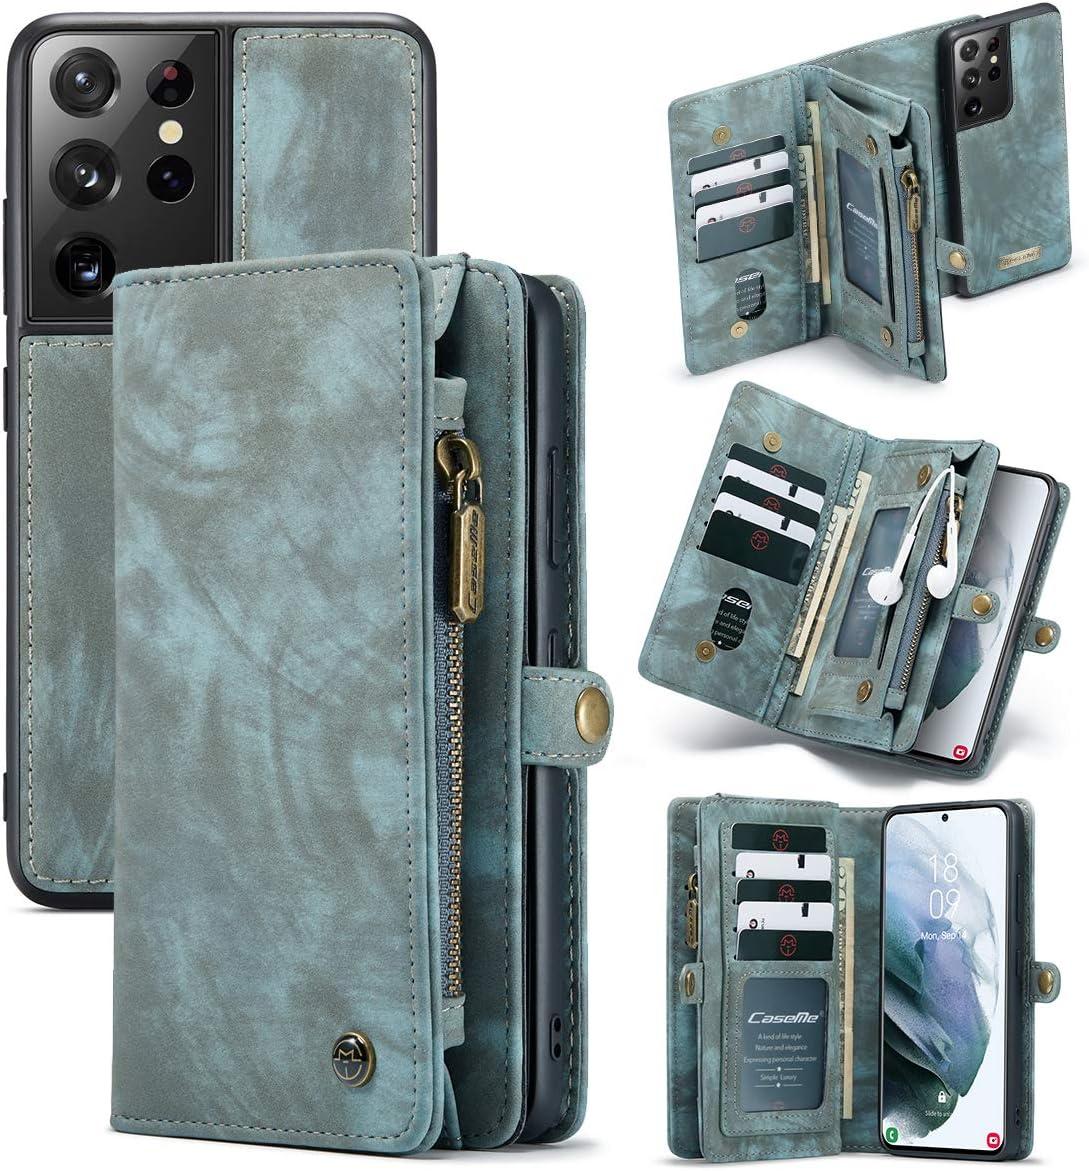 Galaxy S21+ Plus Wallet Case,AKHVRS Handmade Premium PU Leather Wallet Case,Zipper Wallet Case [Magnetic Closure] Detachable Magnetic Case & Card Slots for Samsung Galaxy S21+ Plus 6.7